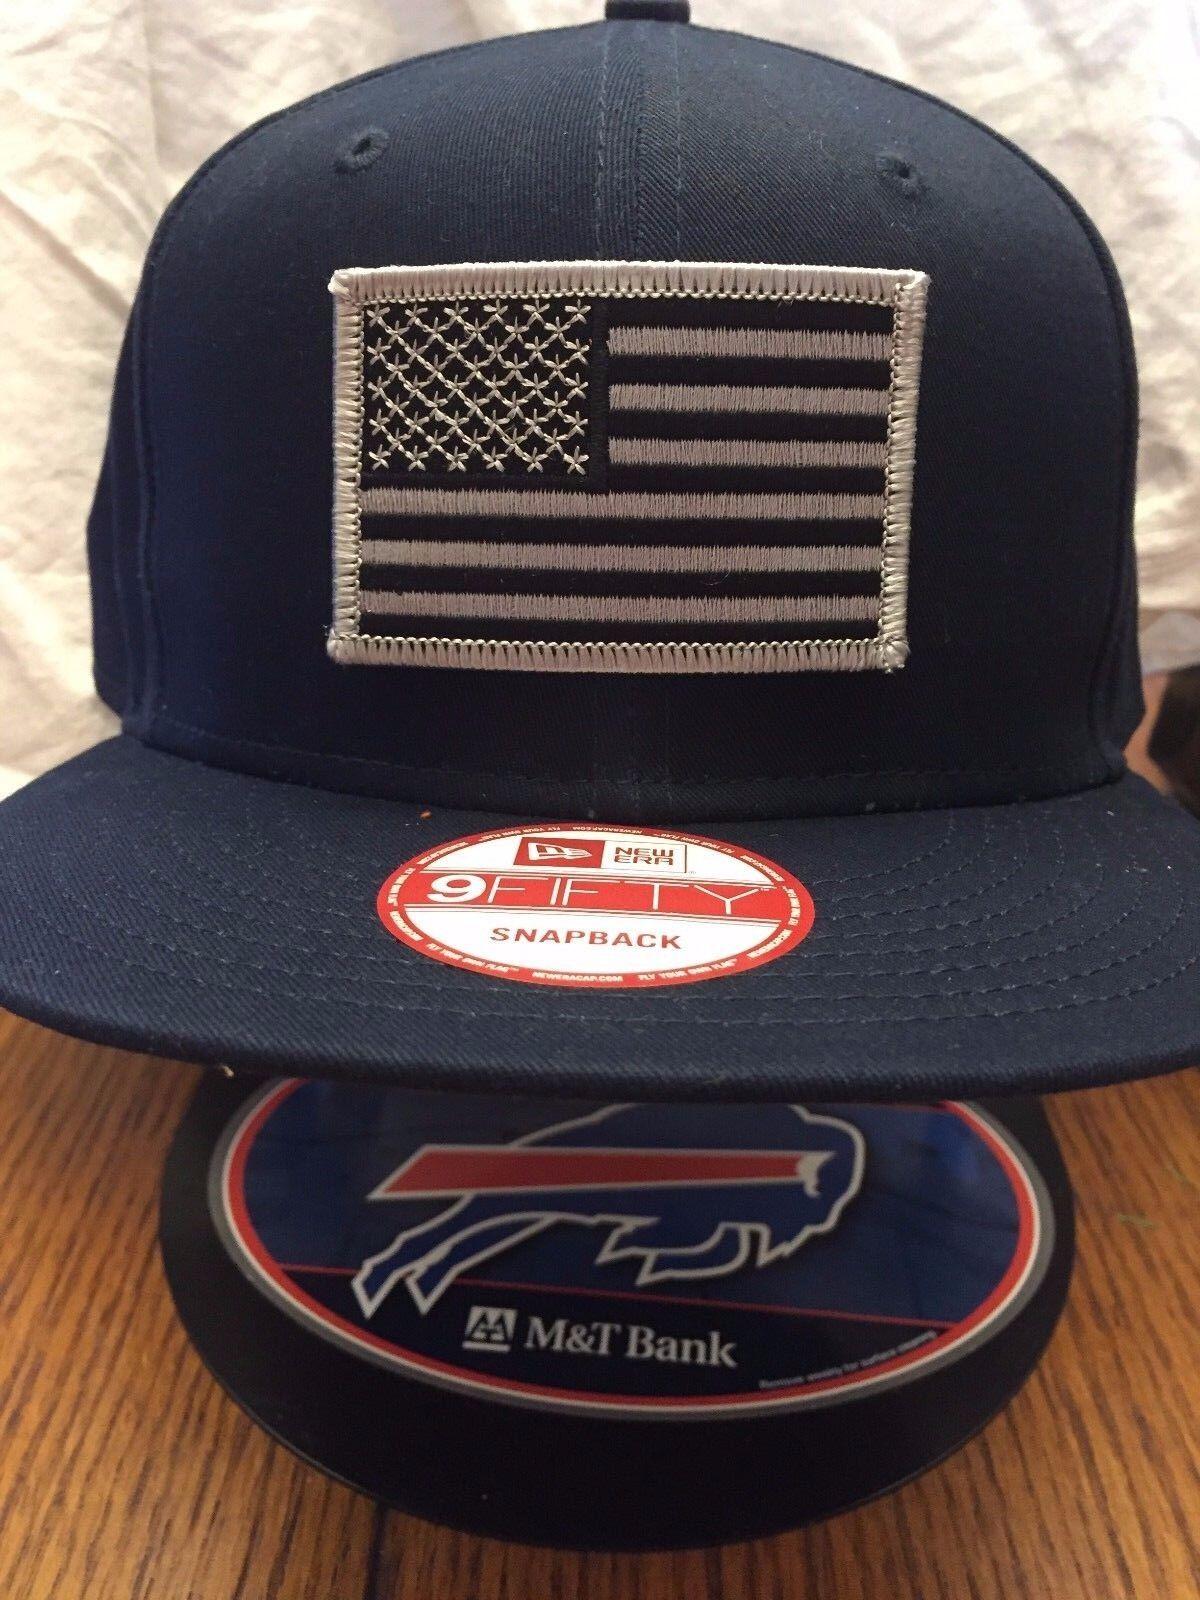 New Era NE400 Charcoal Snapback Flat Bill Cap w// Red Black American Flag Patch